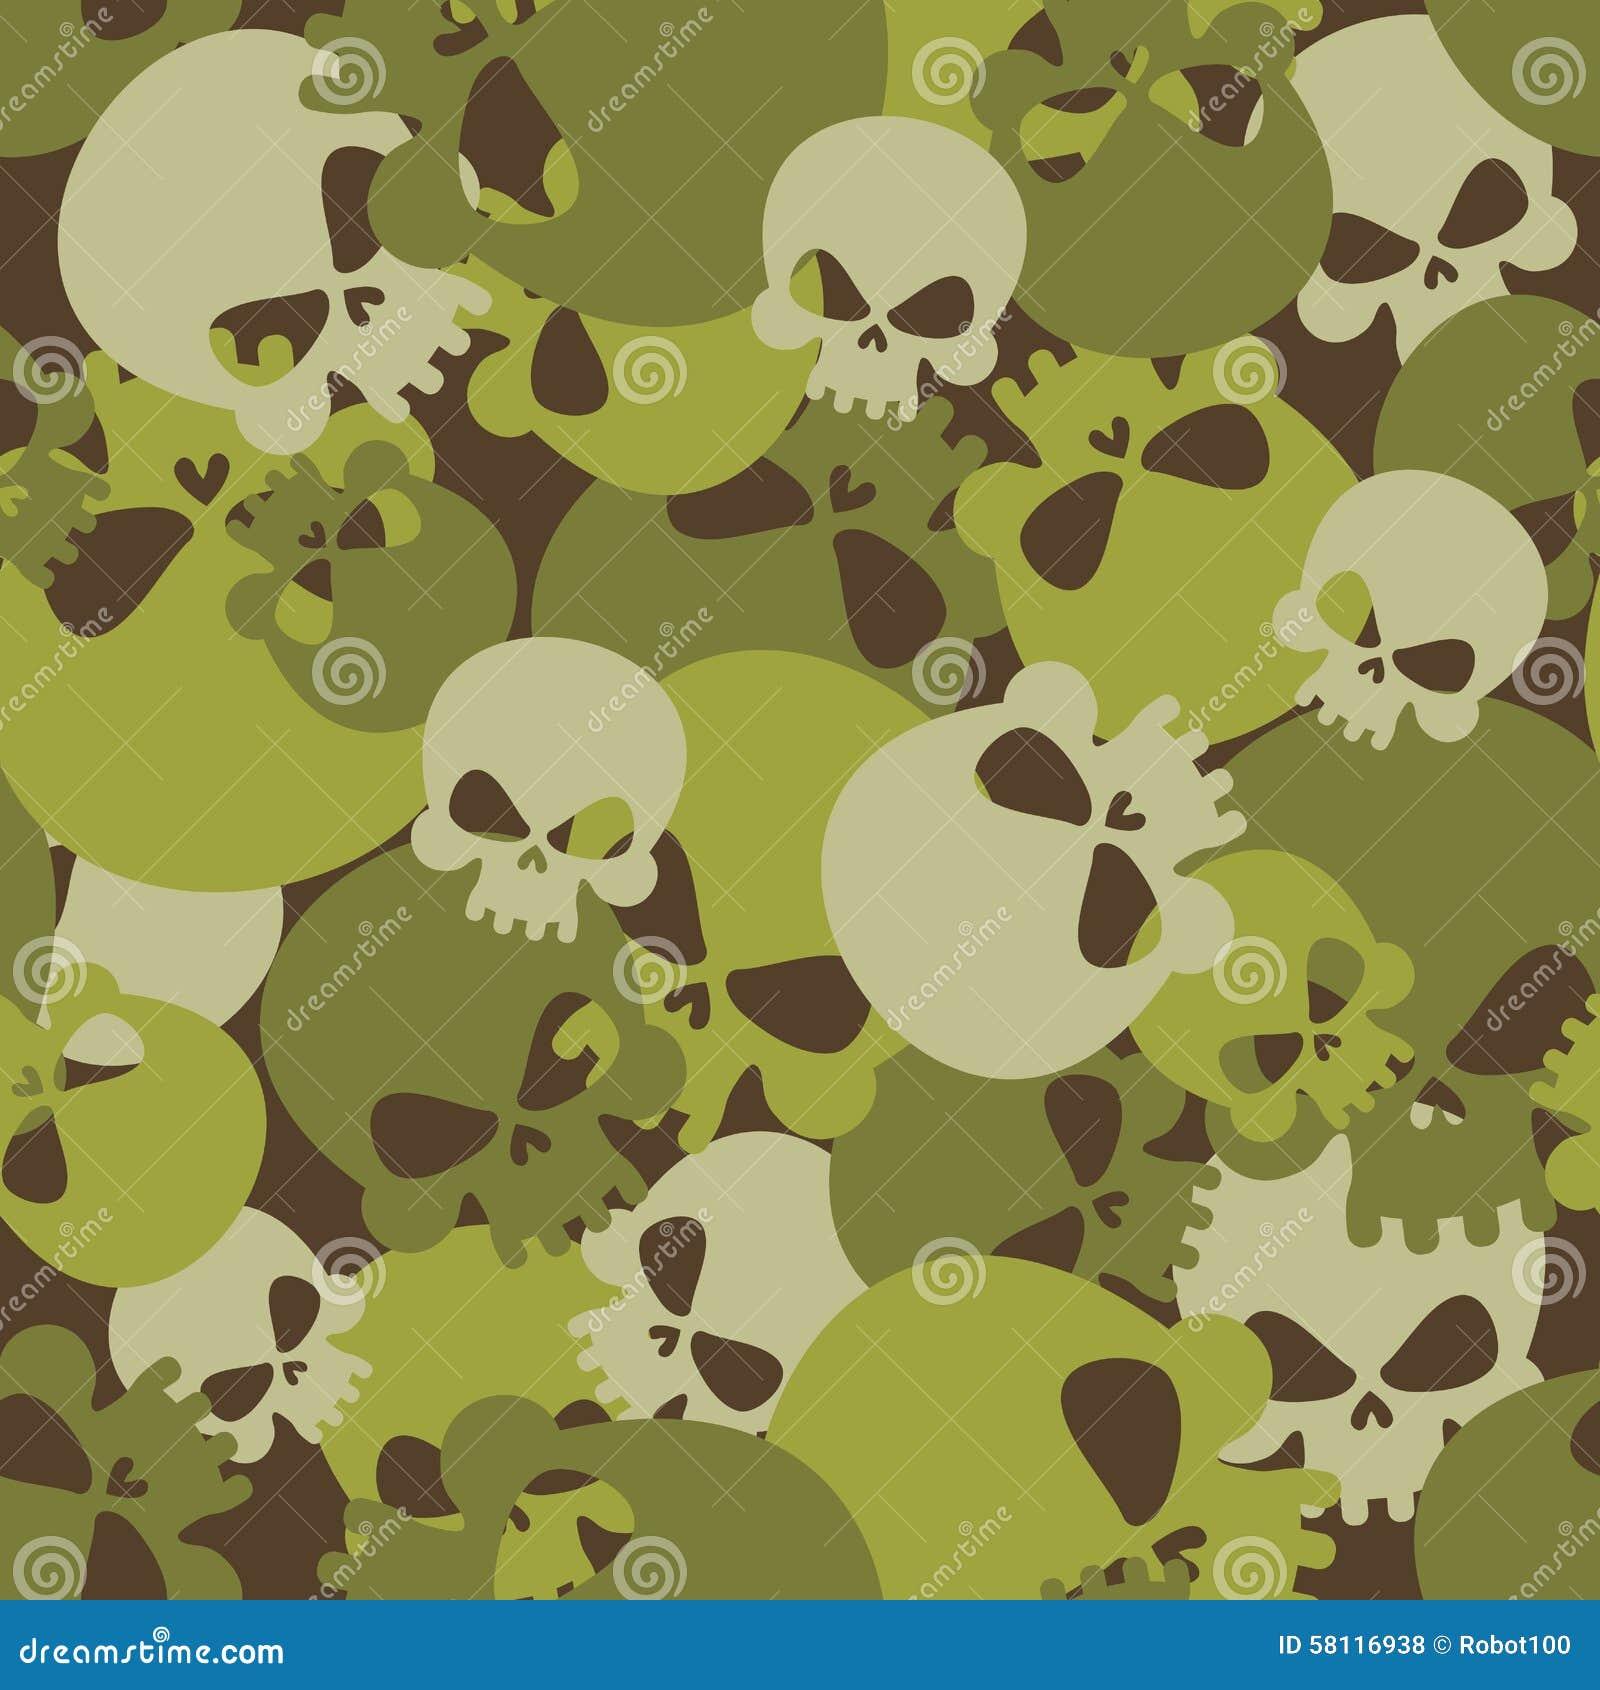 Textura Militar De Cráneos Modelo Inconsútil Del Ejército Del ...